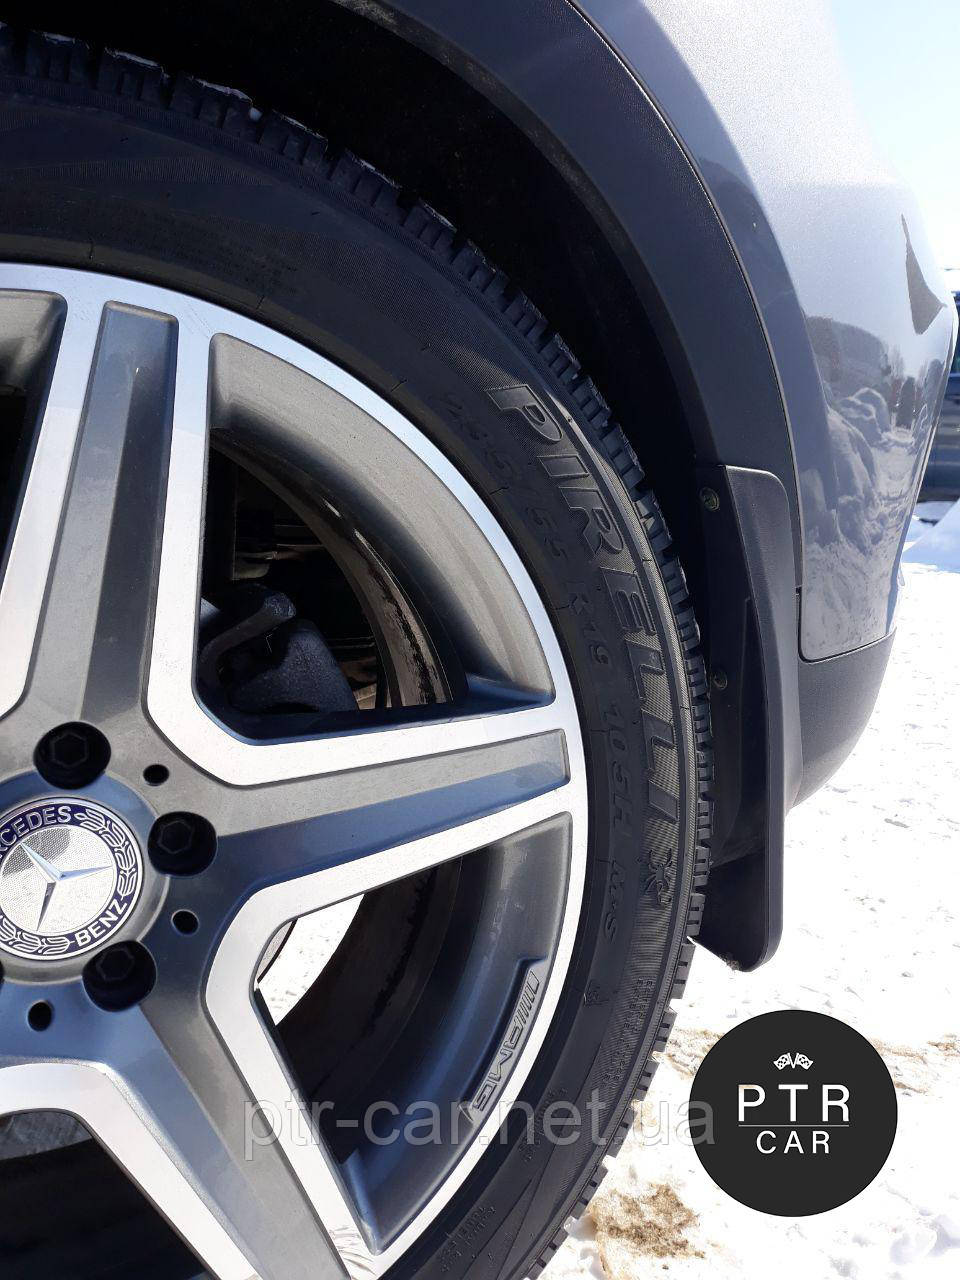 Брызговики Peugeot 2008 2013- (полный кт 4-шт)